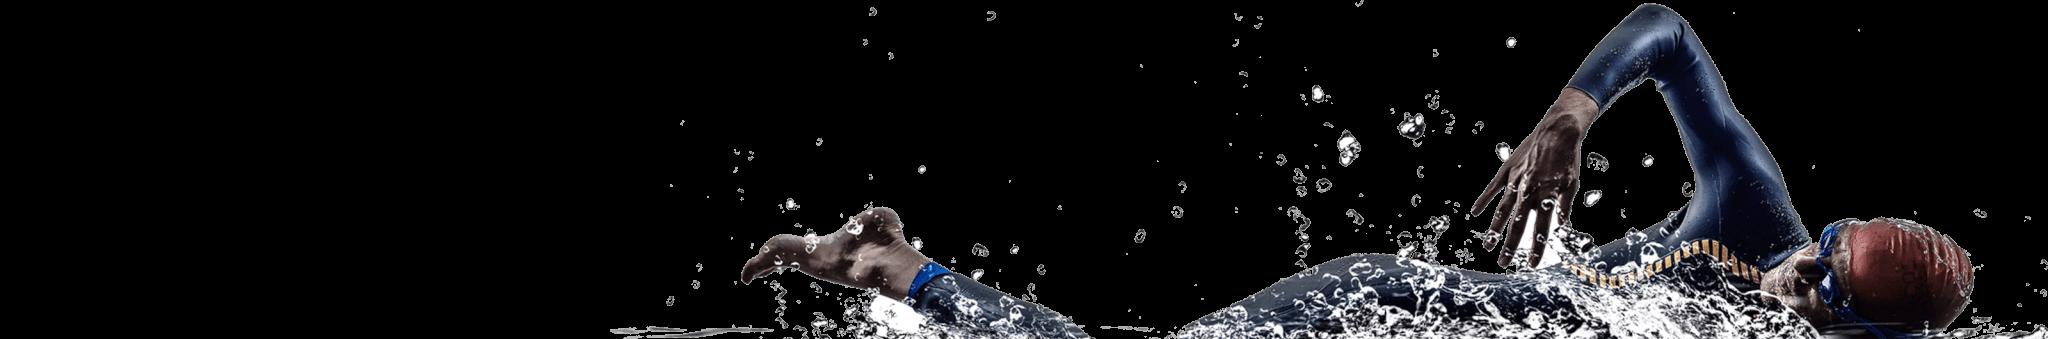 http://www.igkdf-vanves.fr/wp-content/uploads/2017/10/inner_swimmer.png